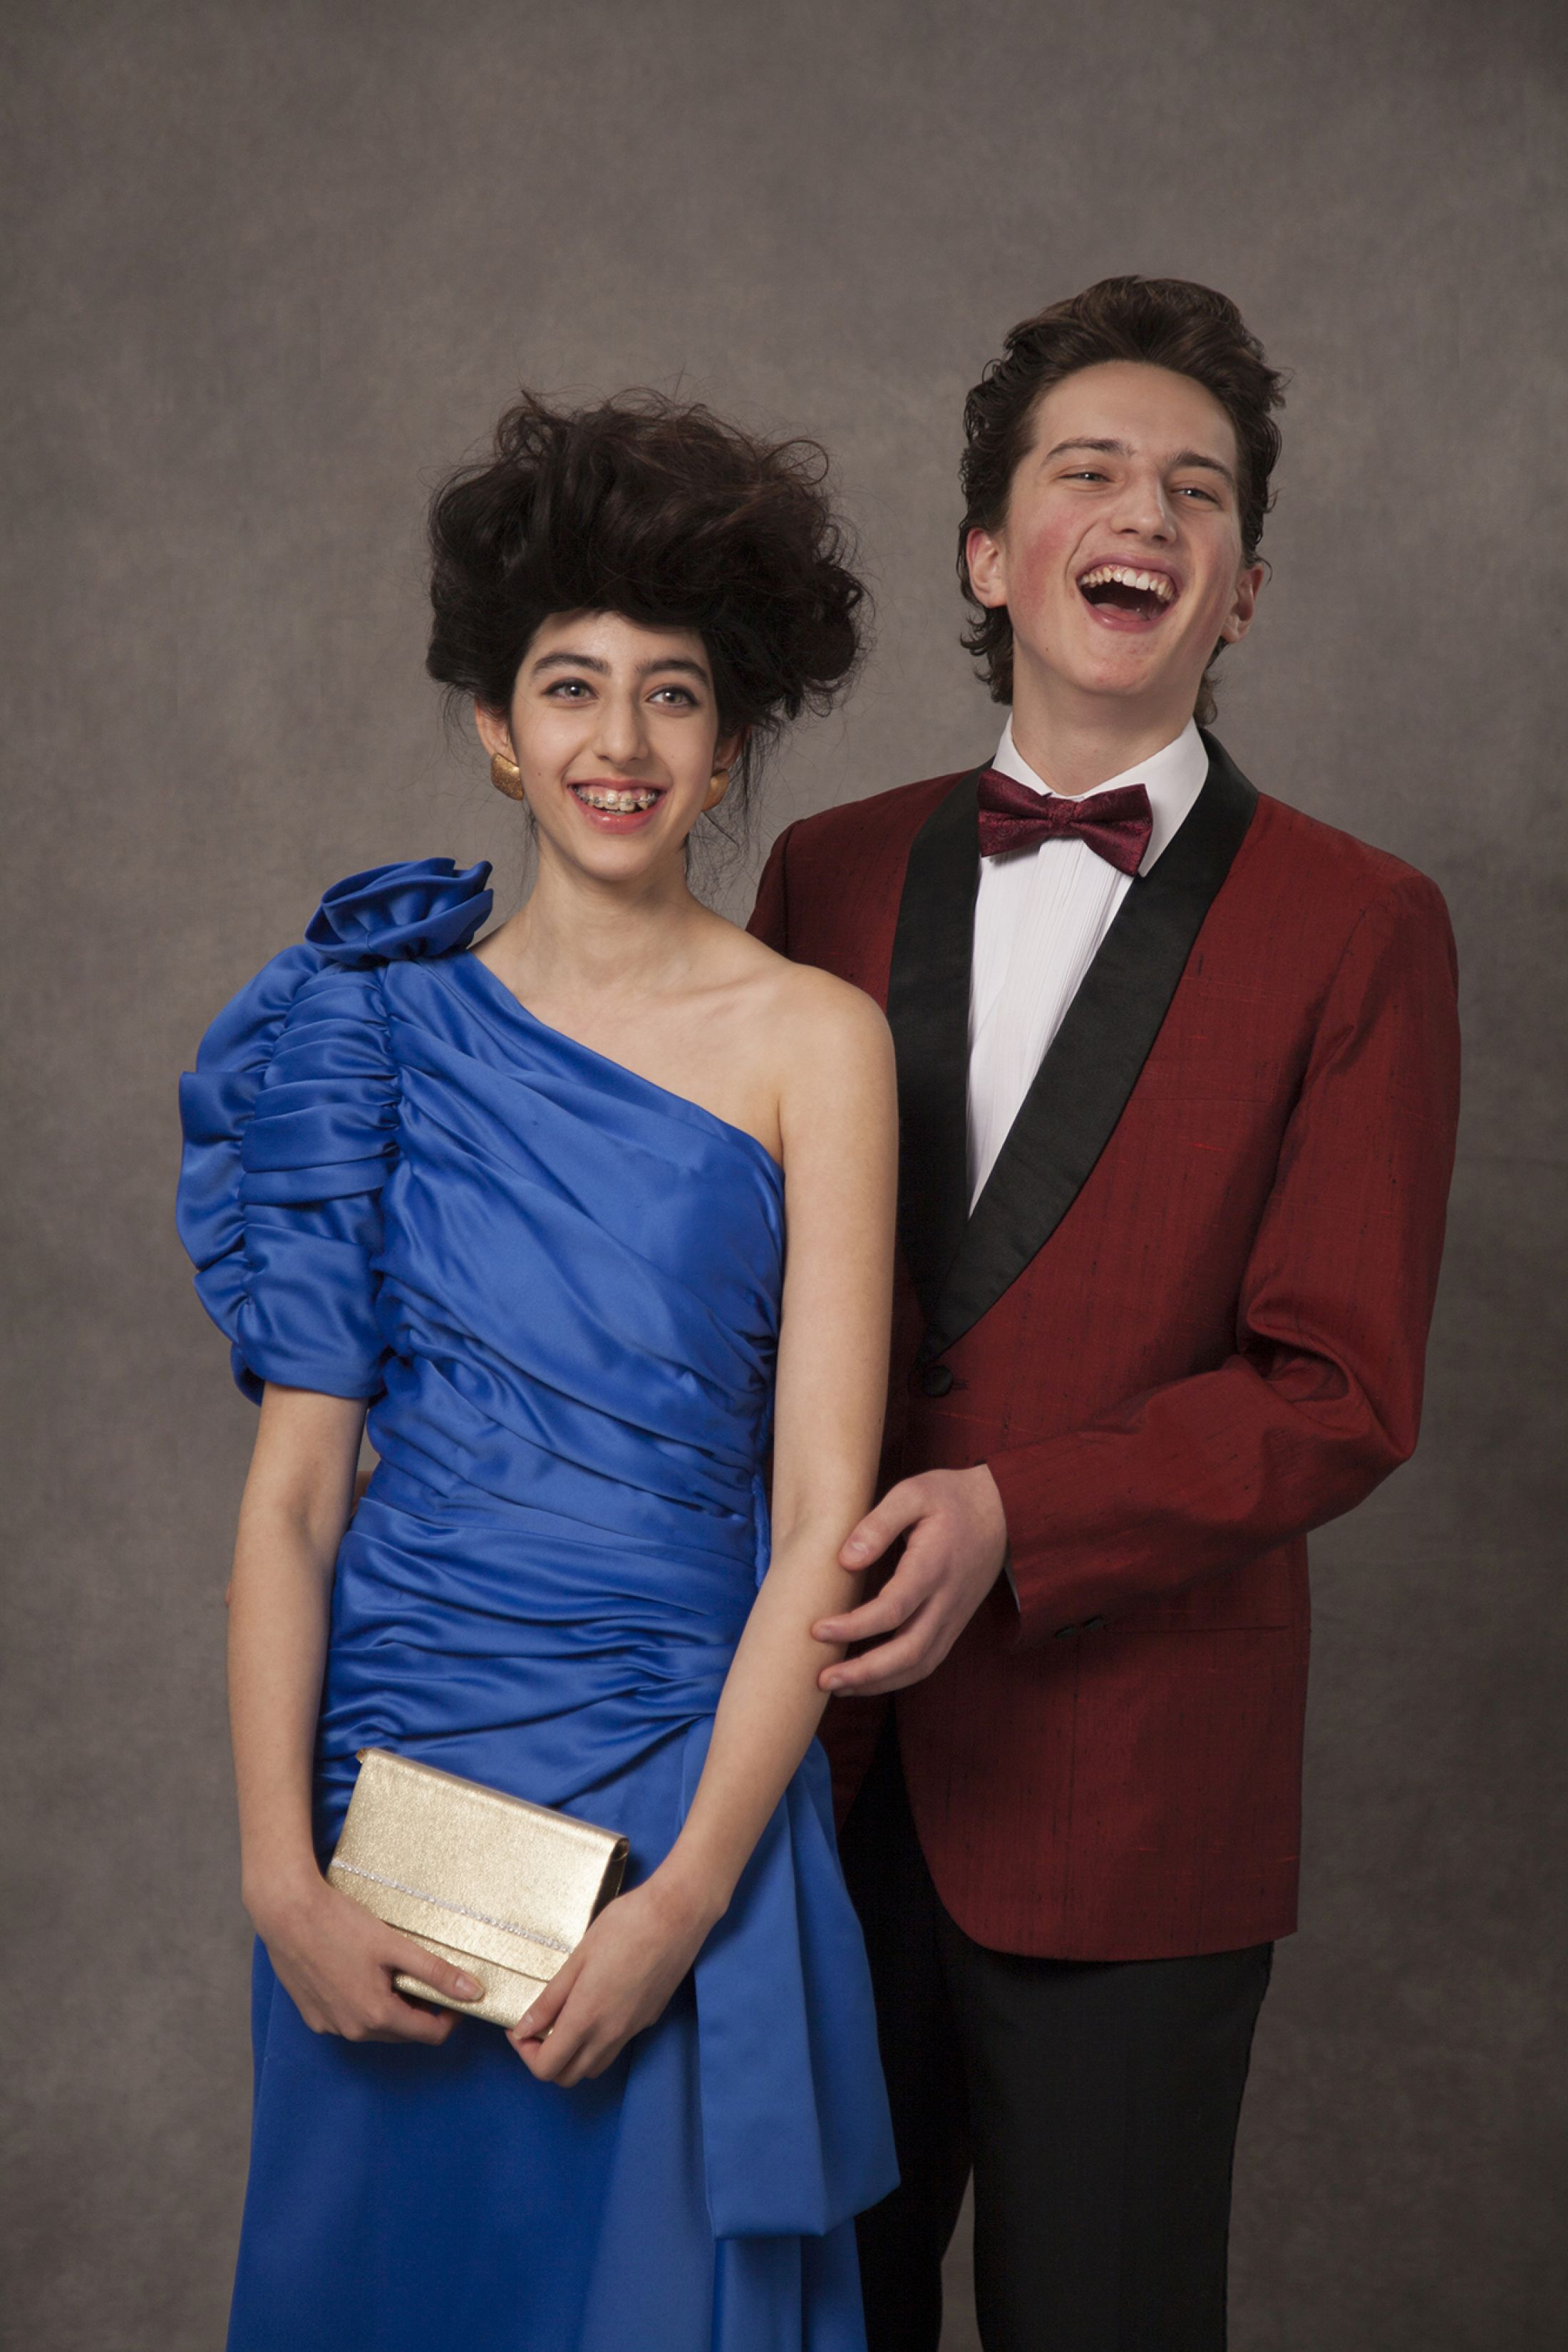 A classic, 80s prom photo.